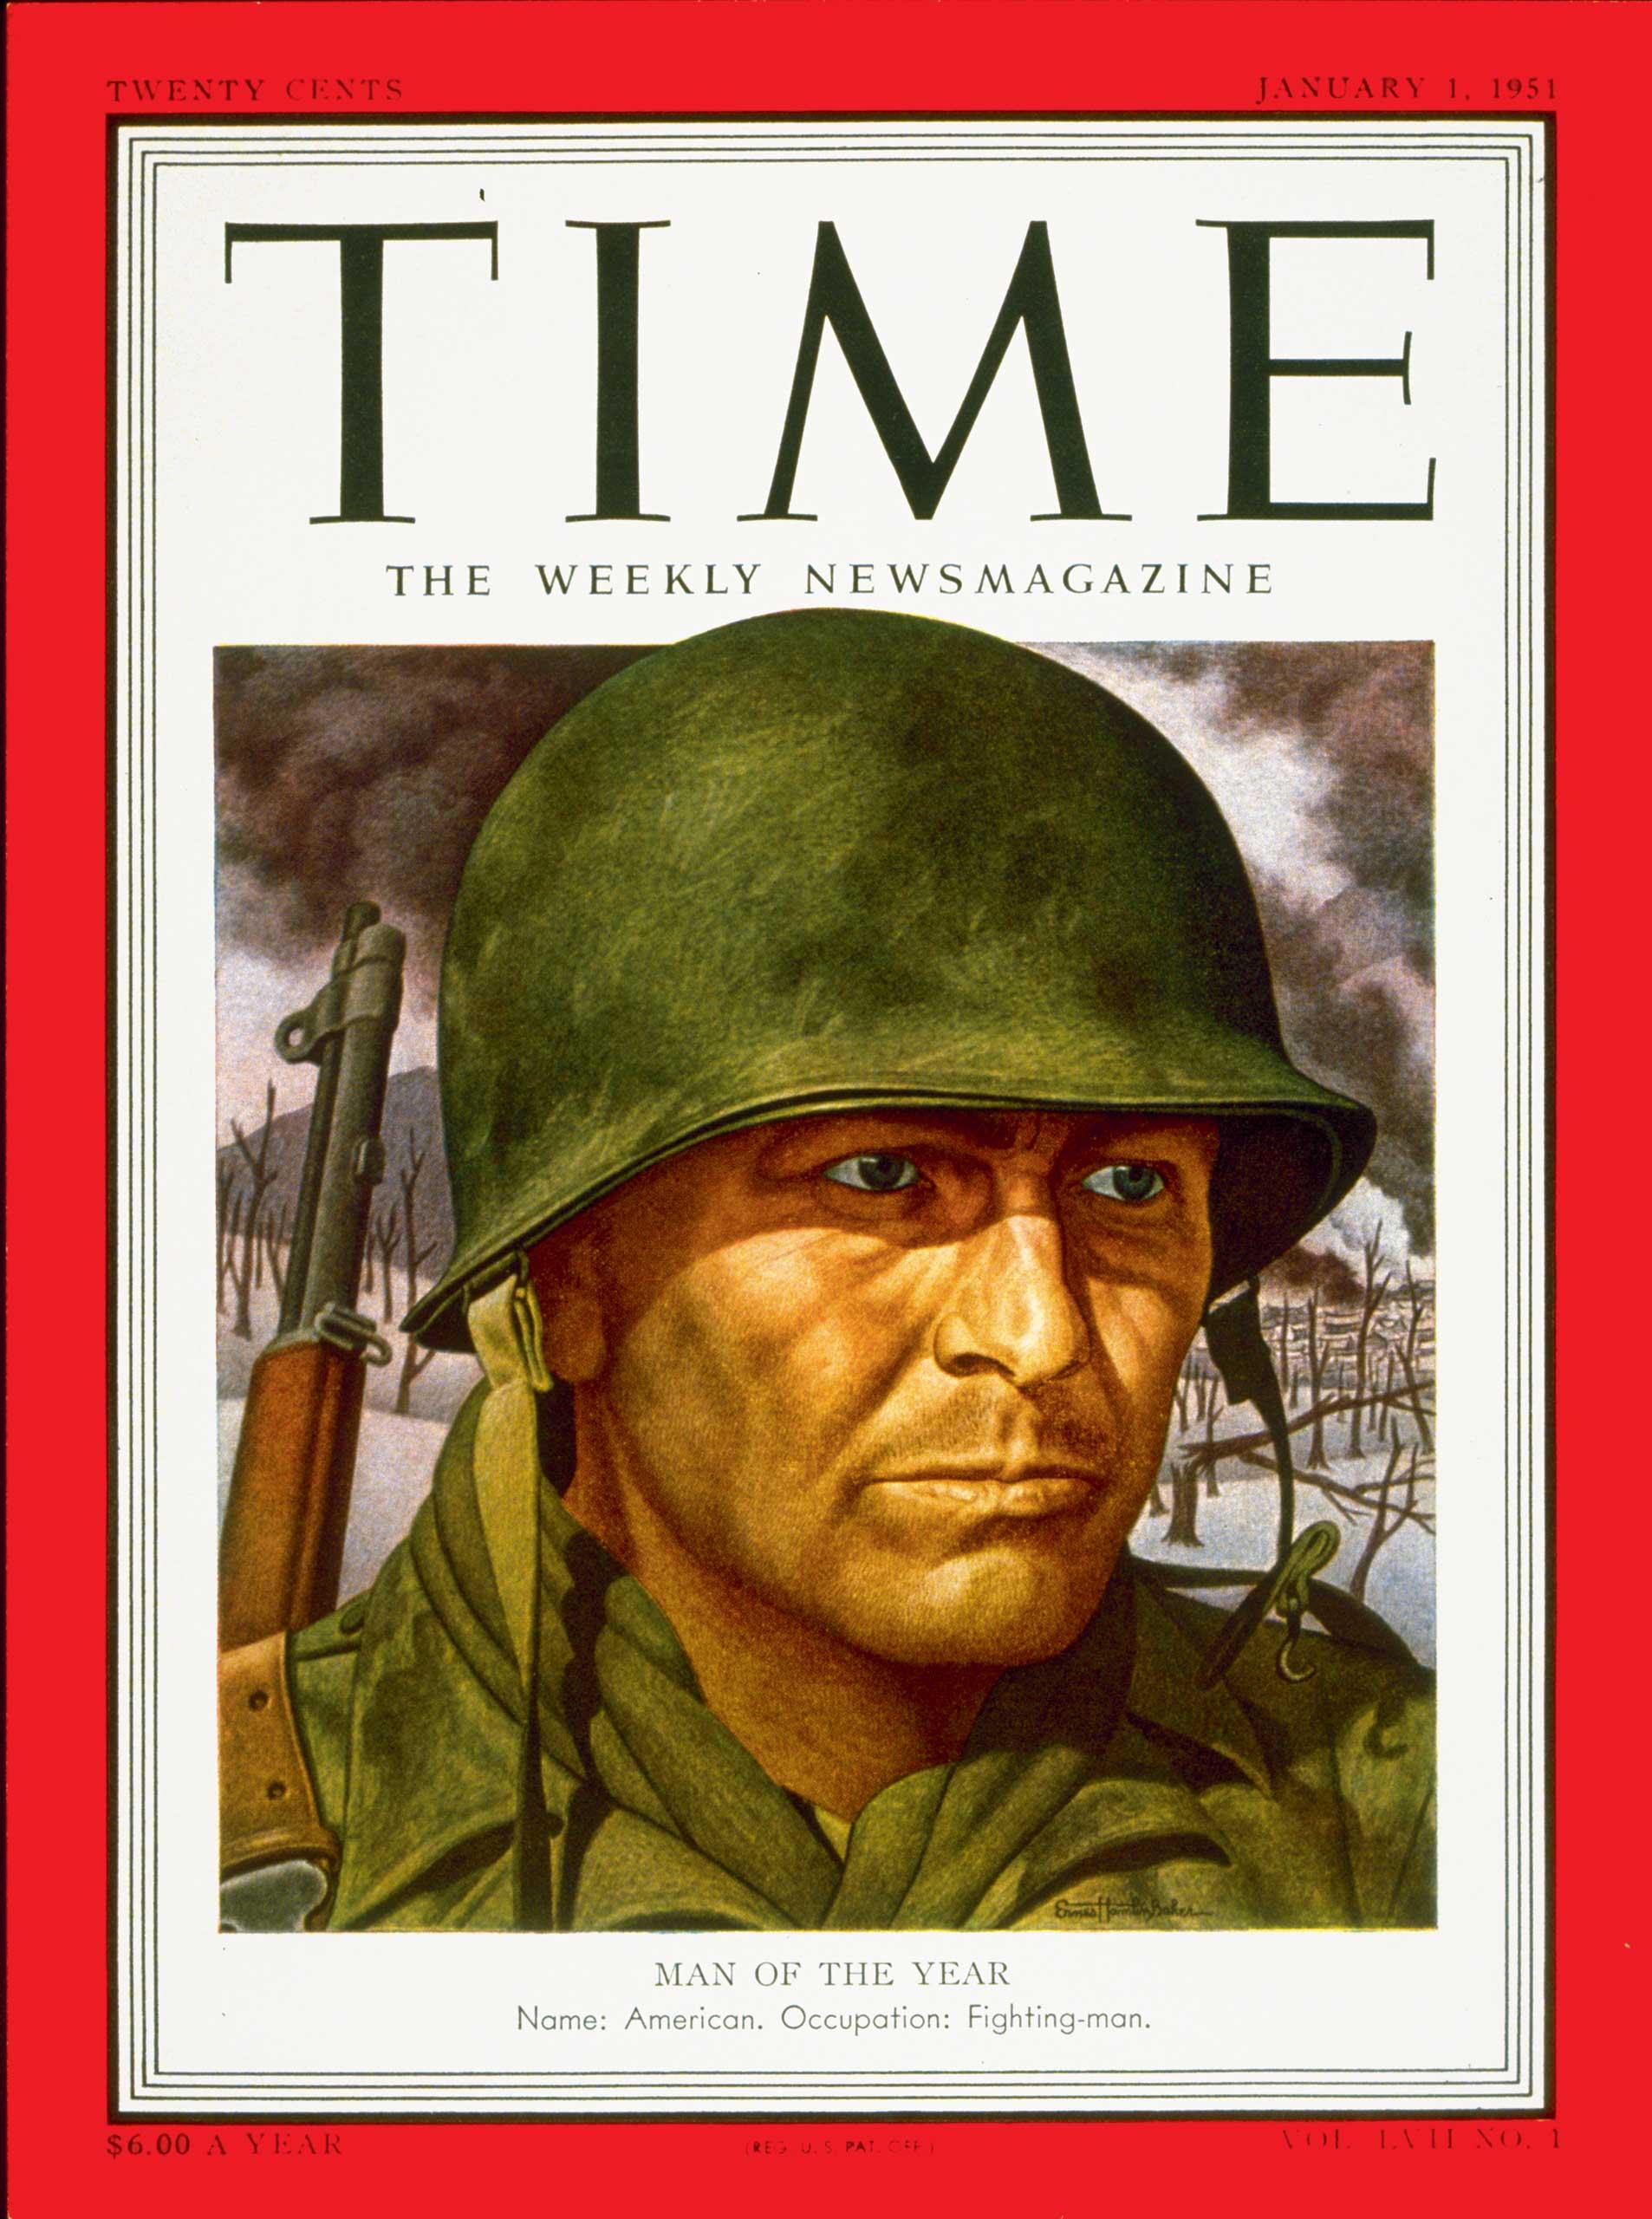 1950: The American Fighting Man